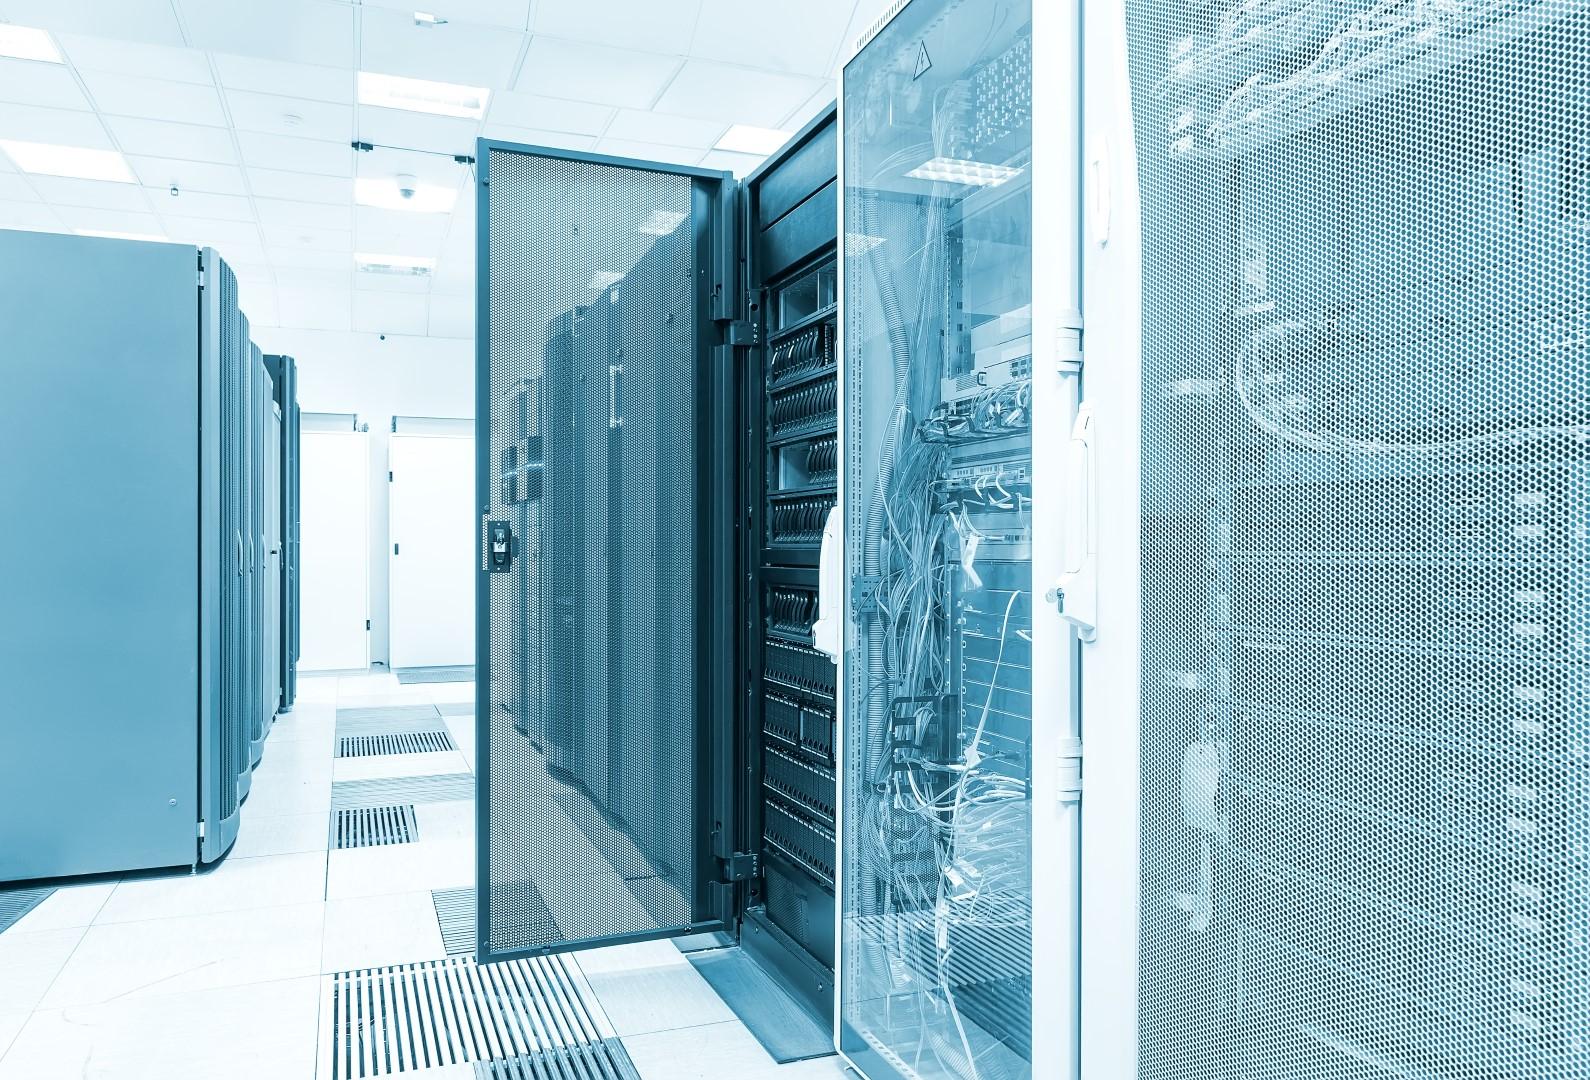 Hyper-convergence + backup software = scale-out backup nodes